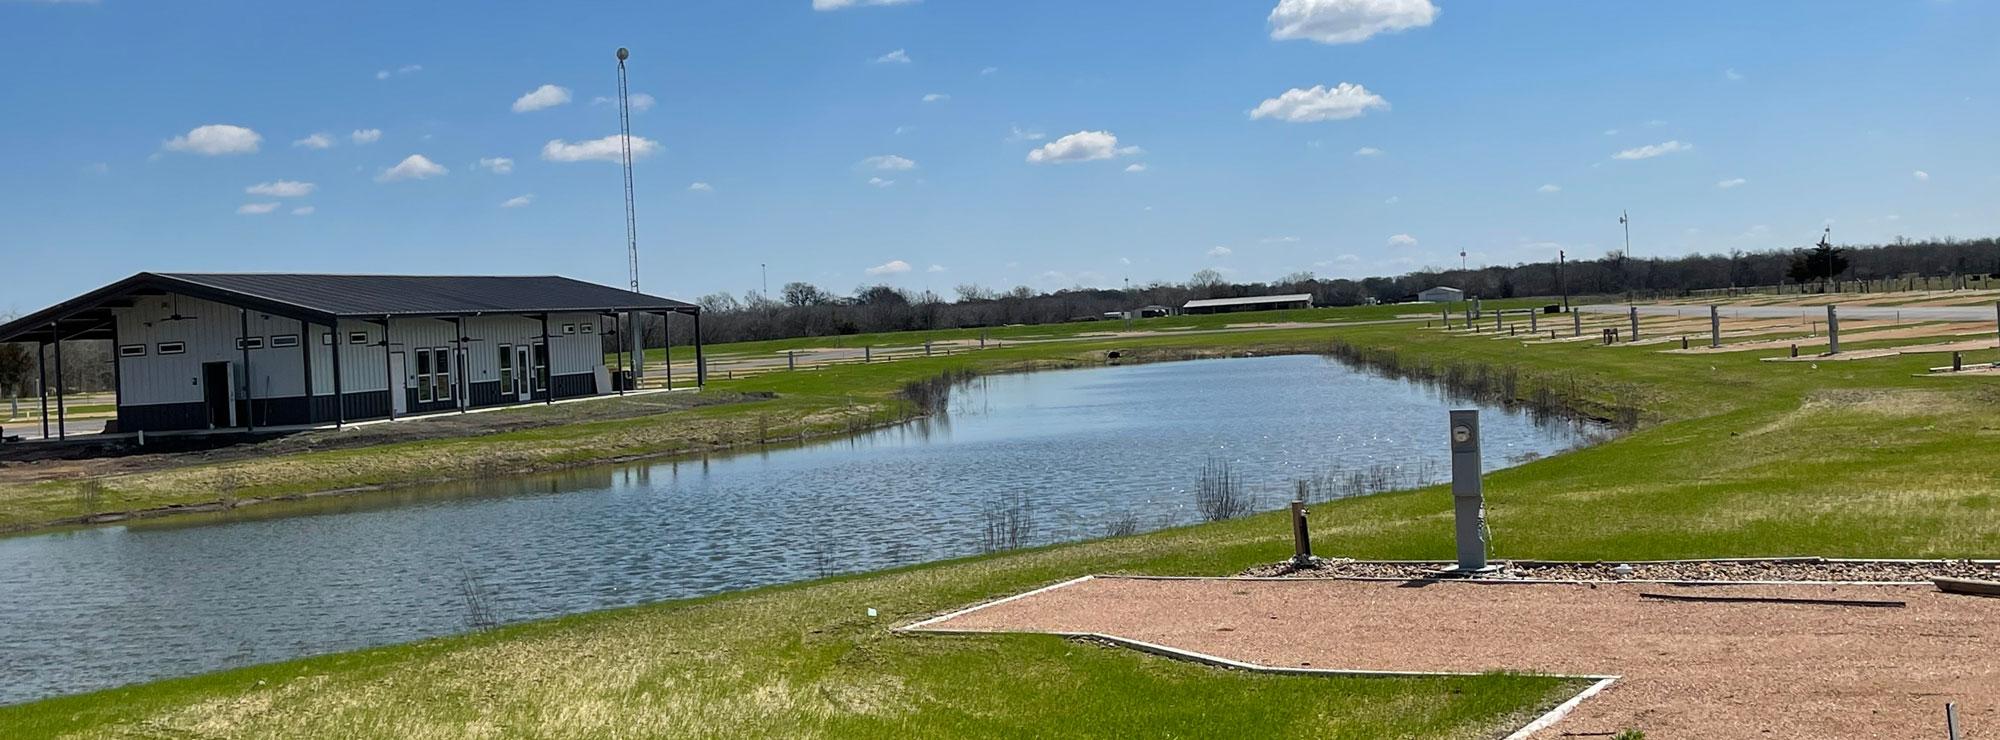 deluxe Texas RV Park